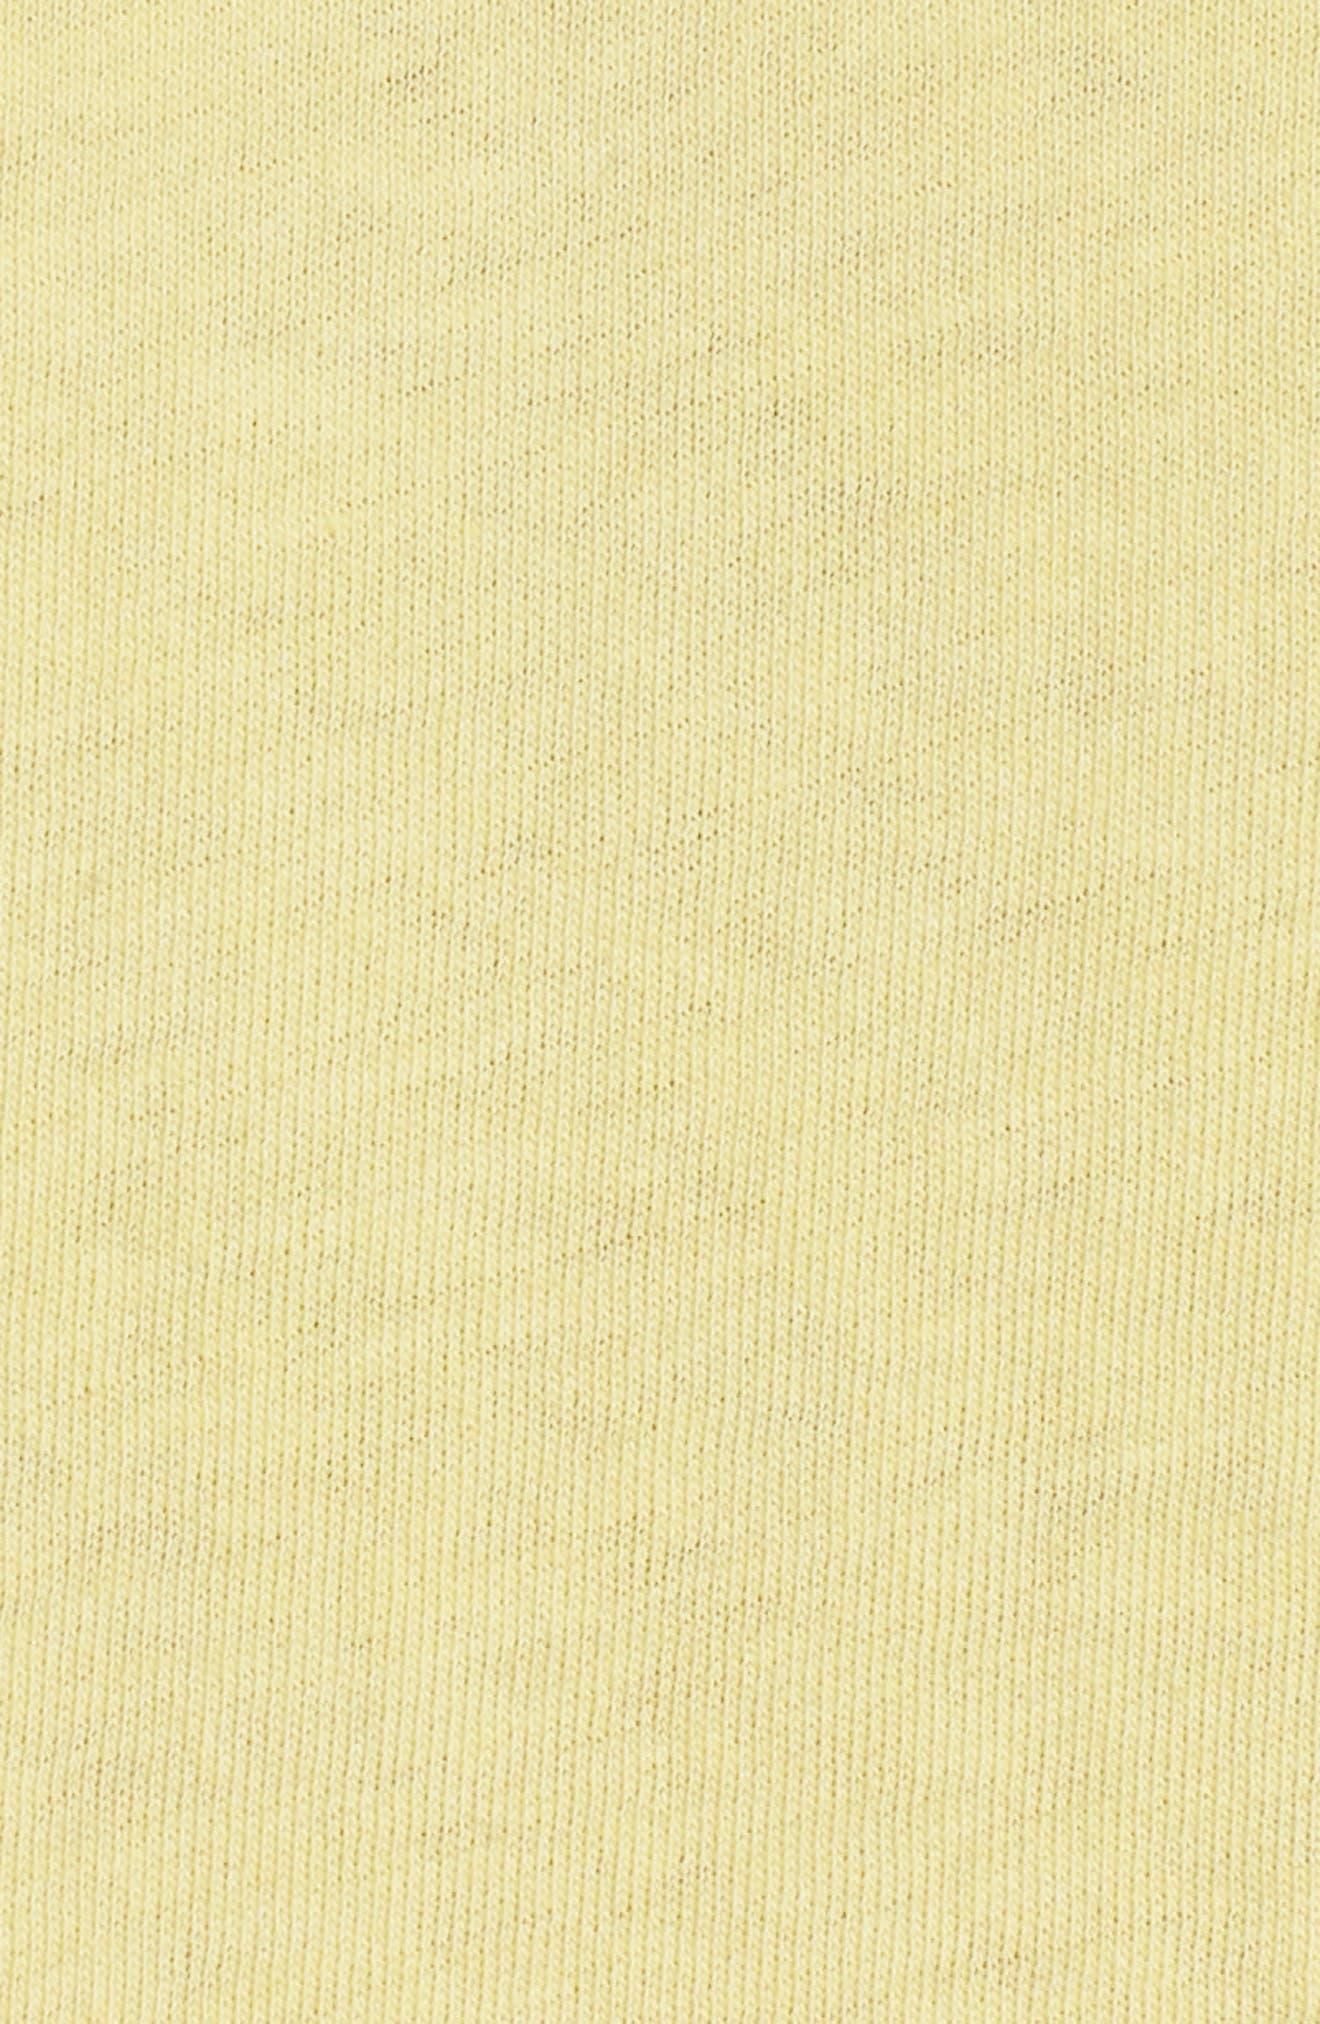 Paris Crop Tee,                             Alternate thumbnail 6, color,                             Washed Yellow